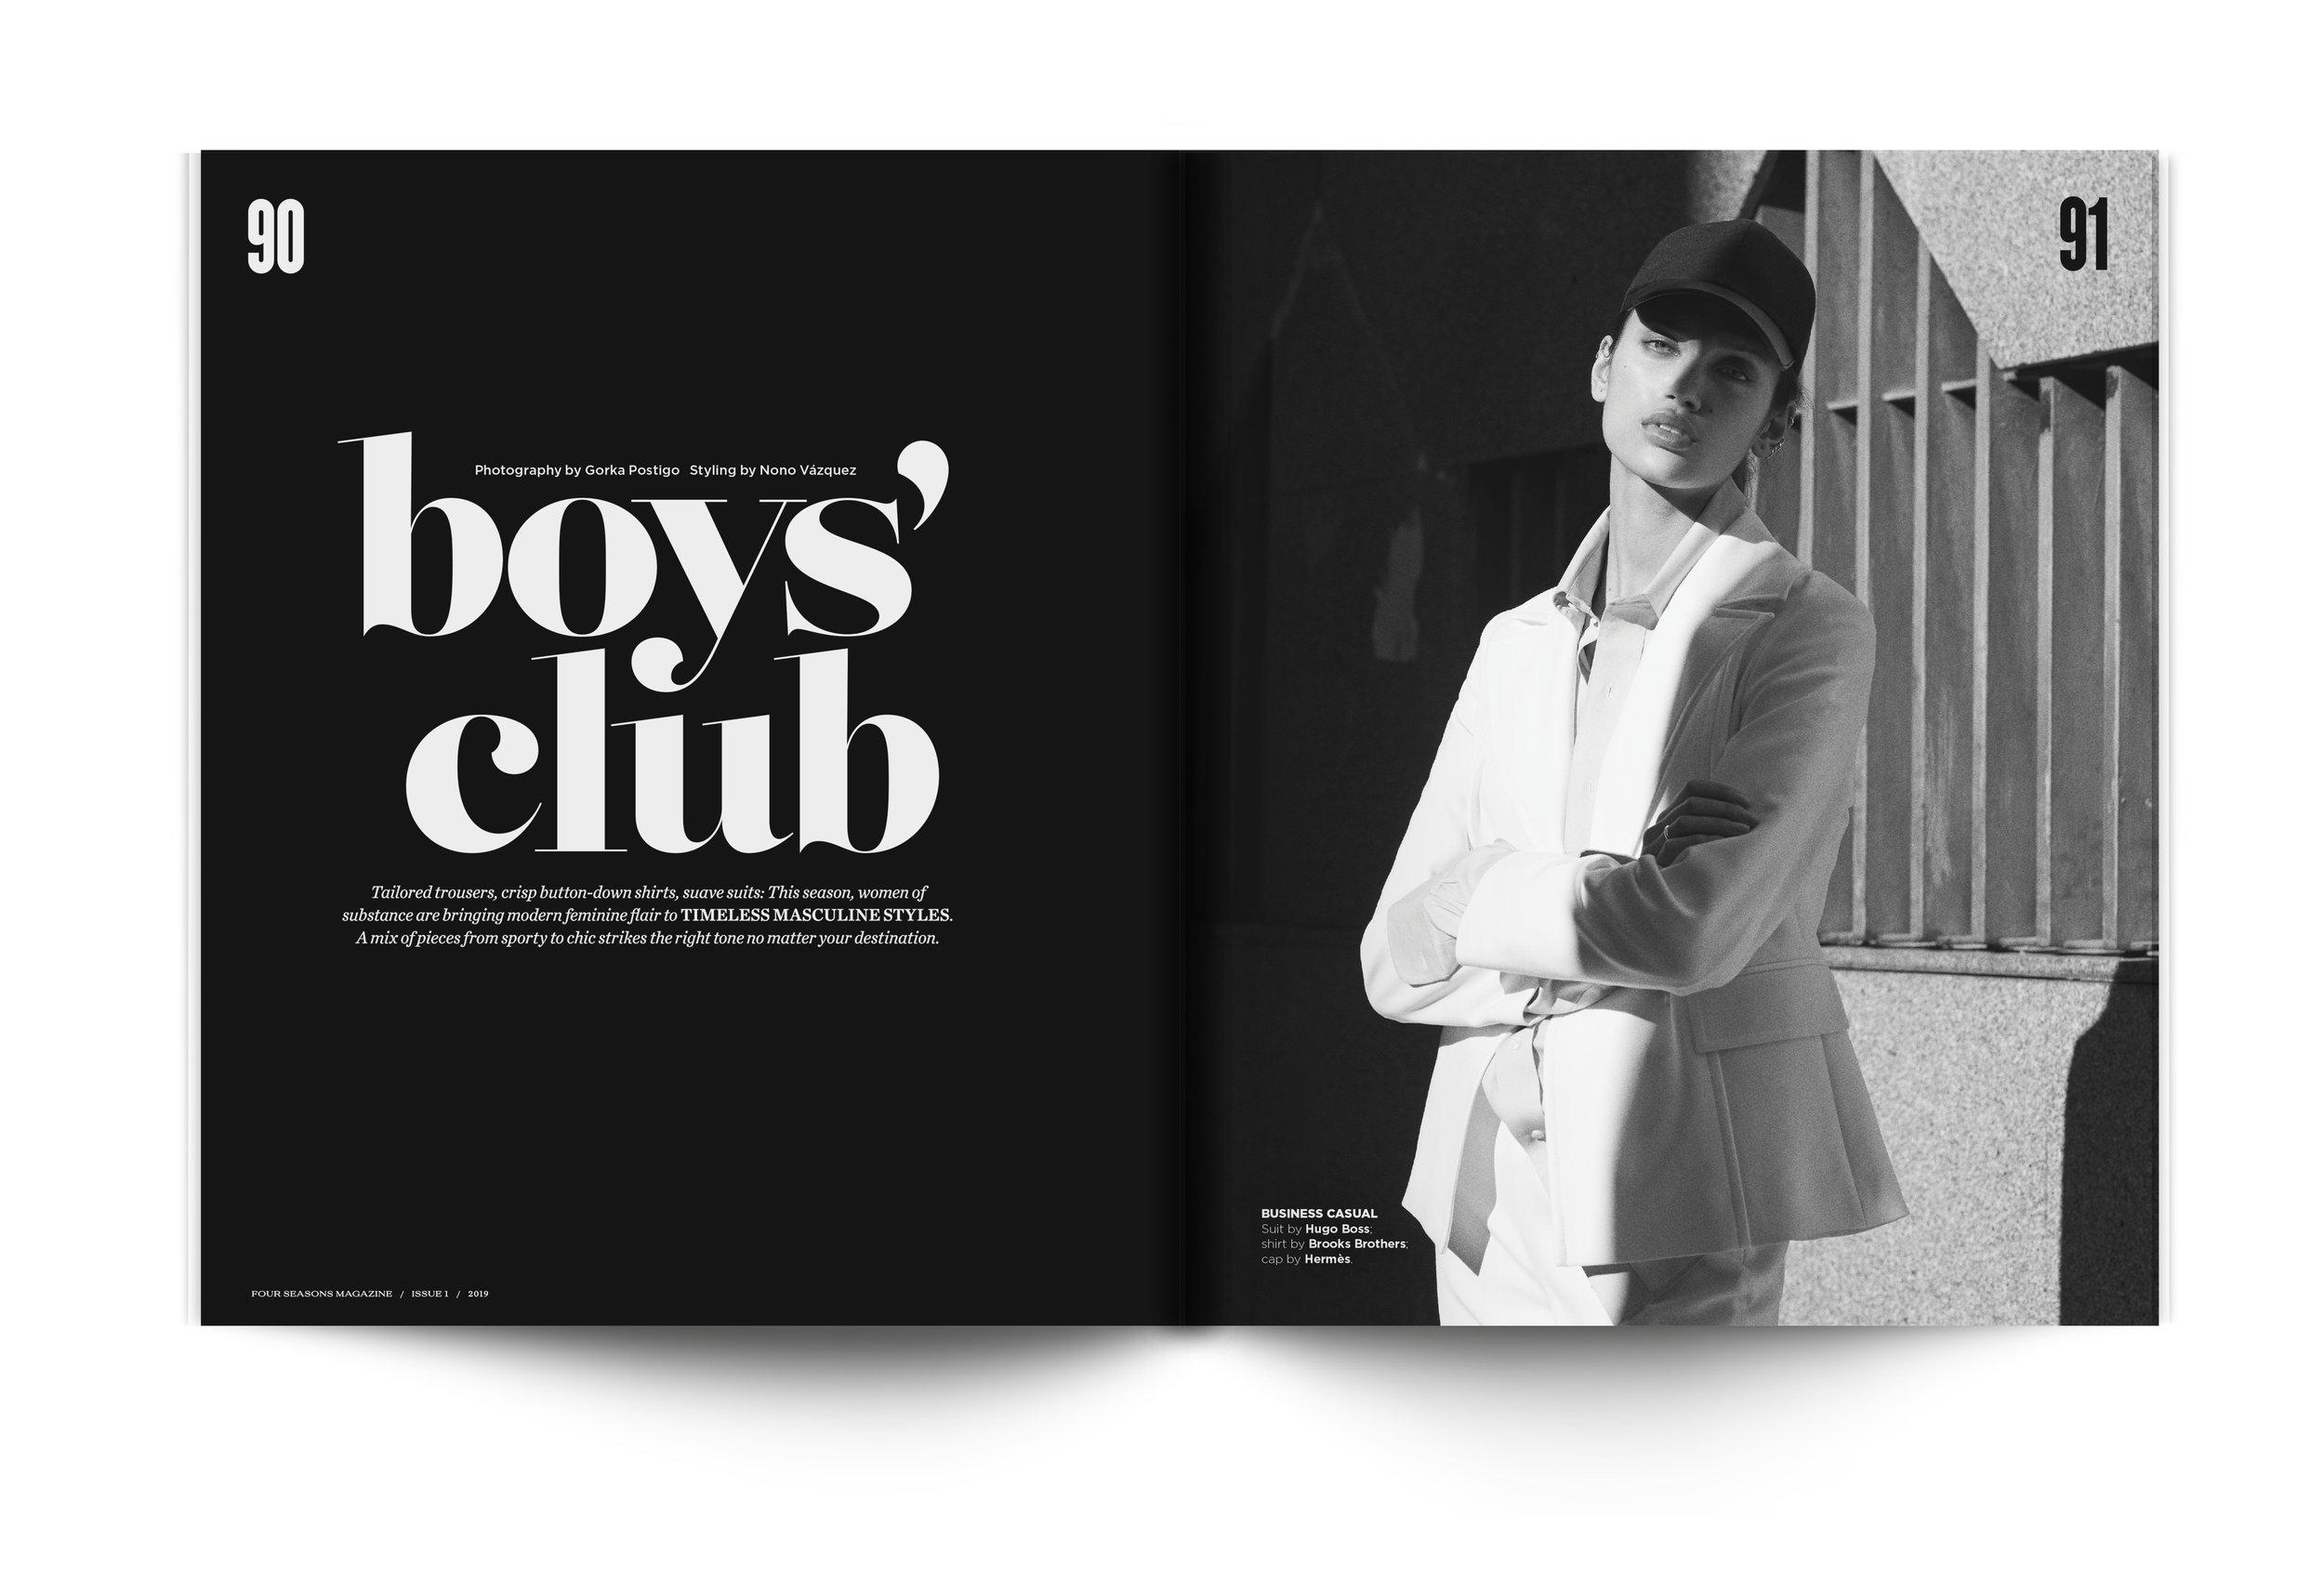 boysclub_01.jpg